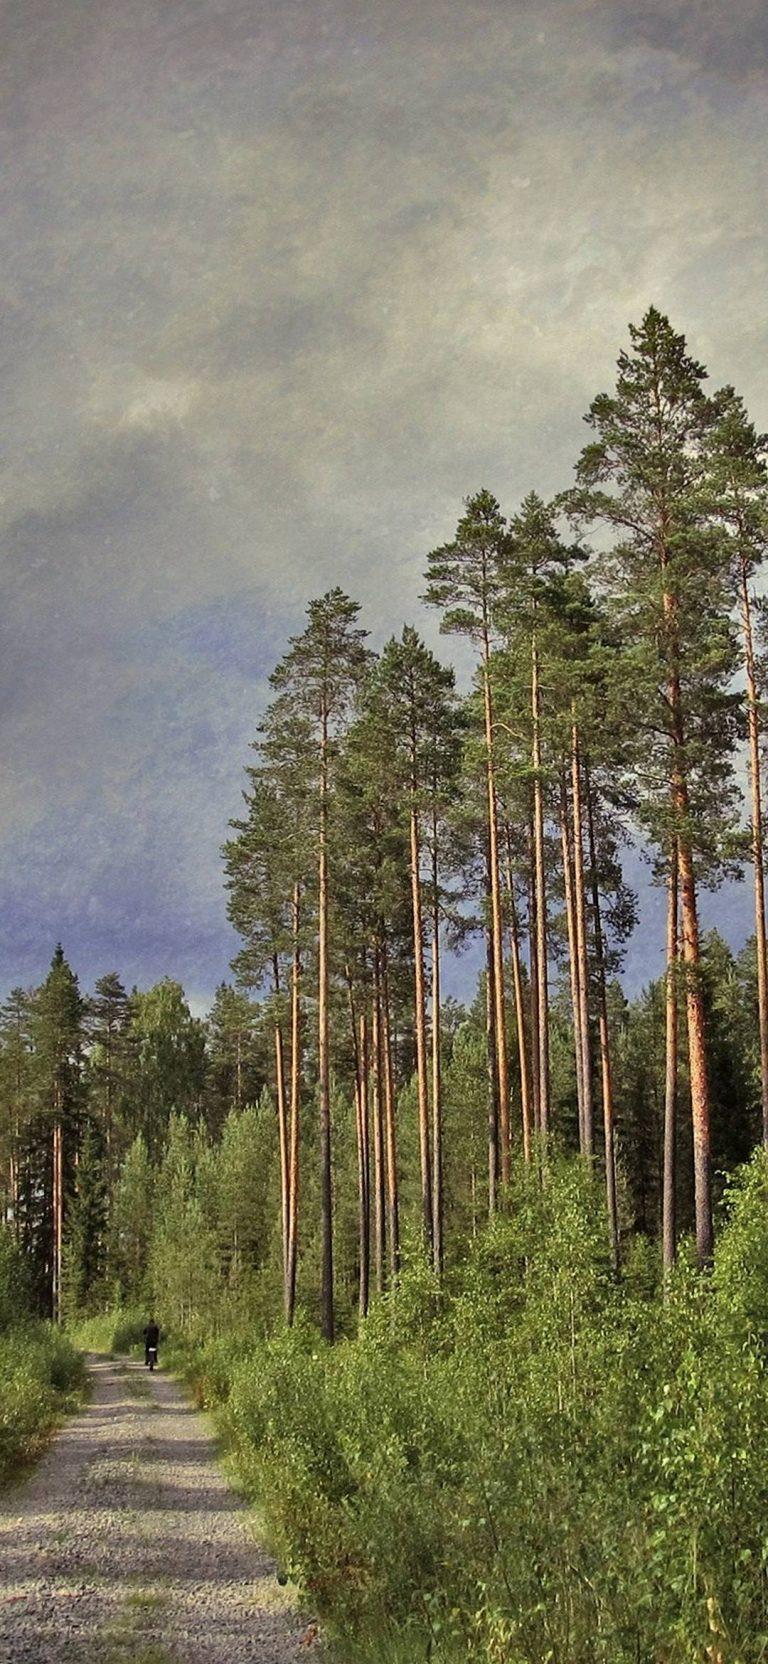 Road Trees Pines 1080x2340 768x1664